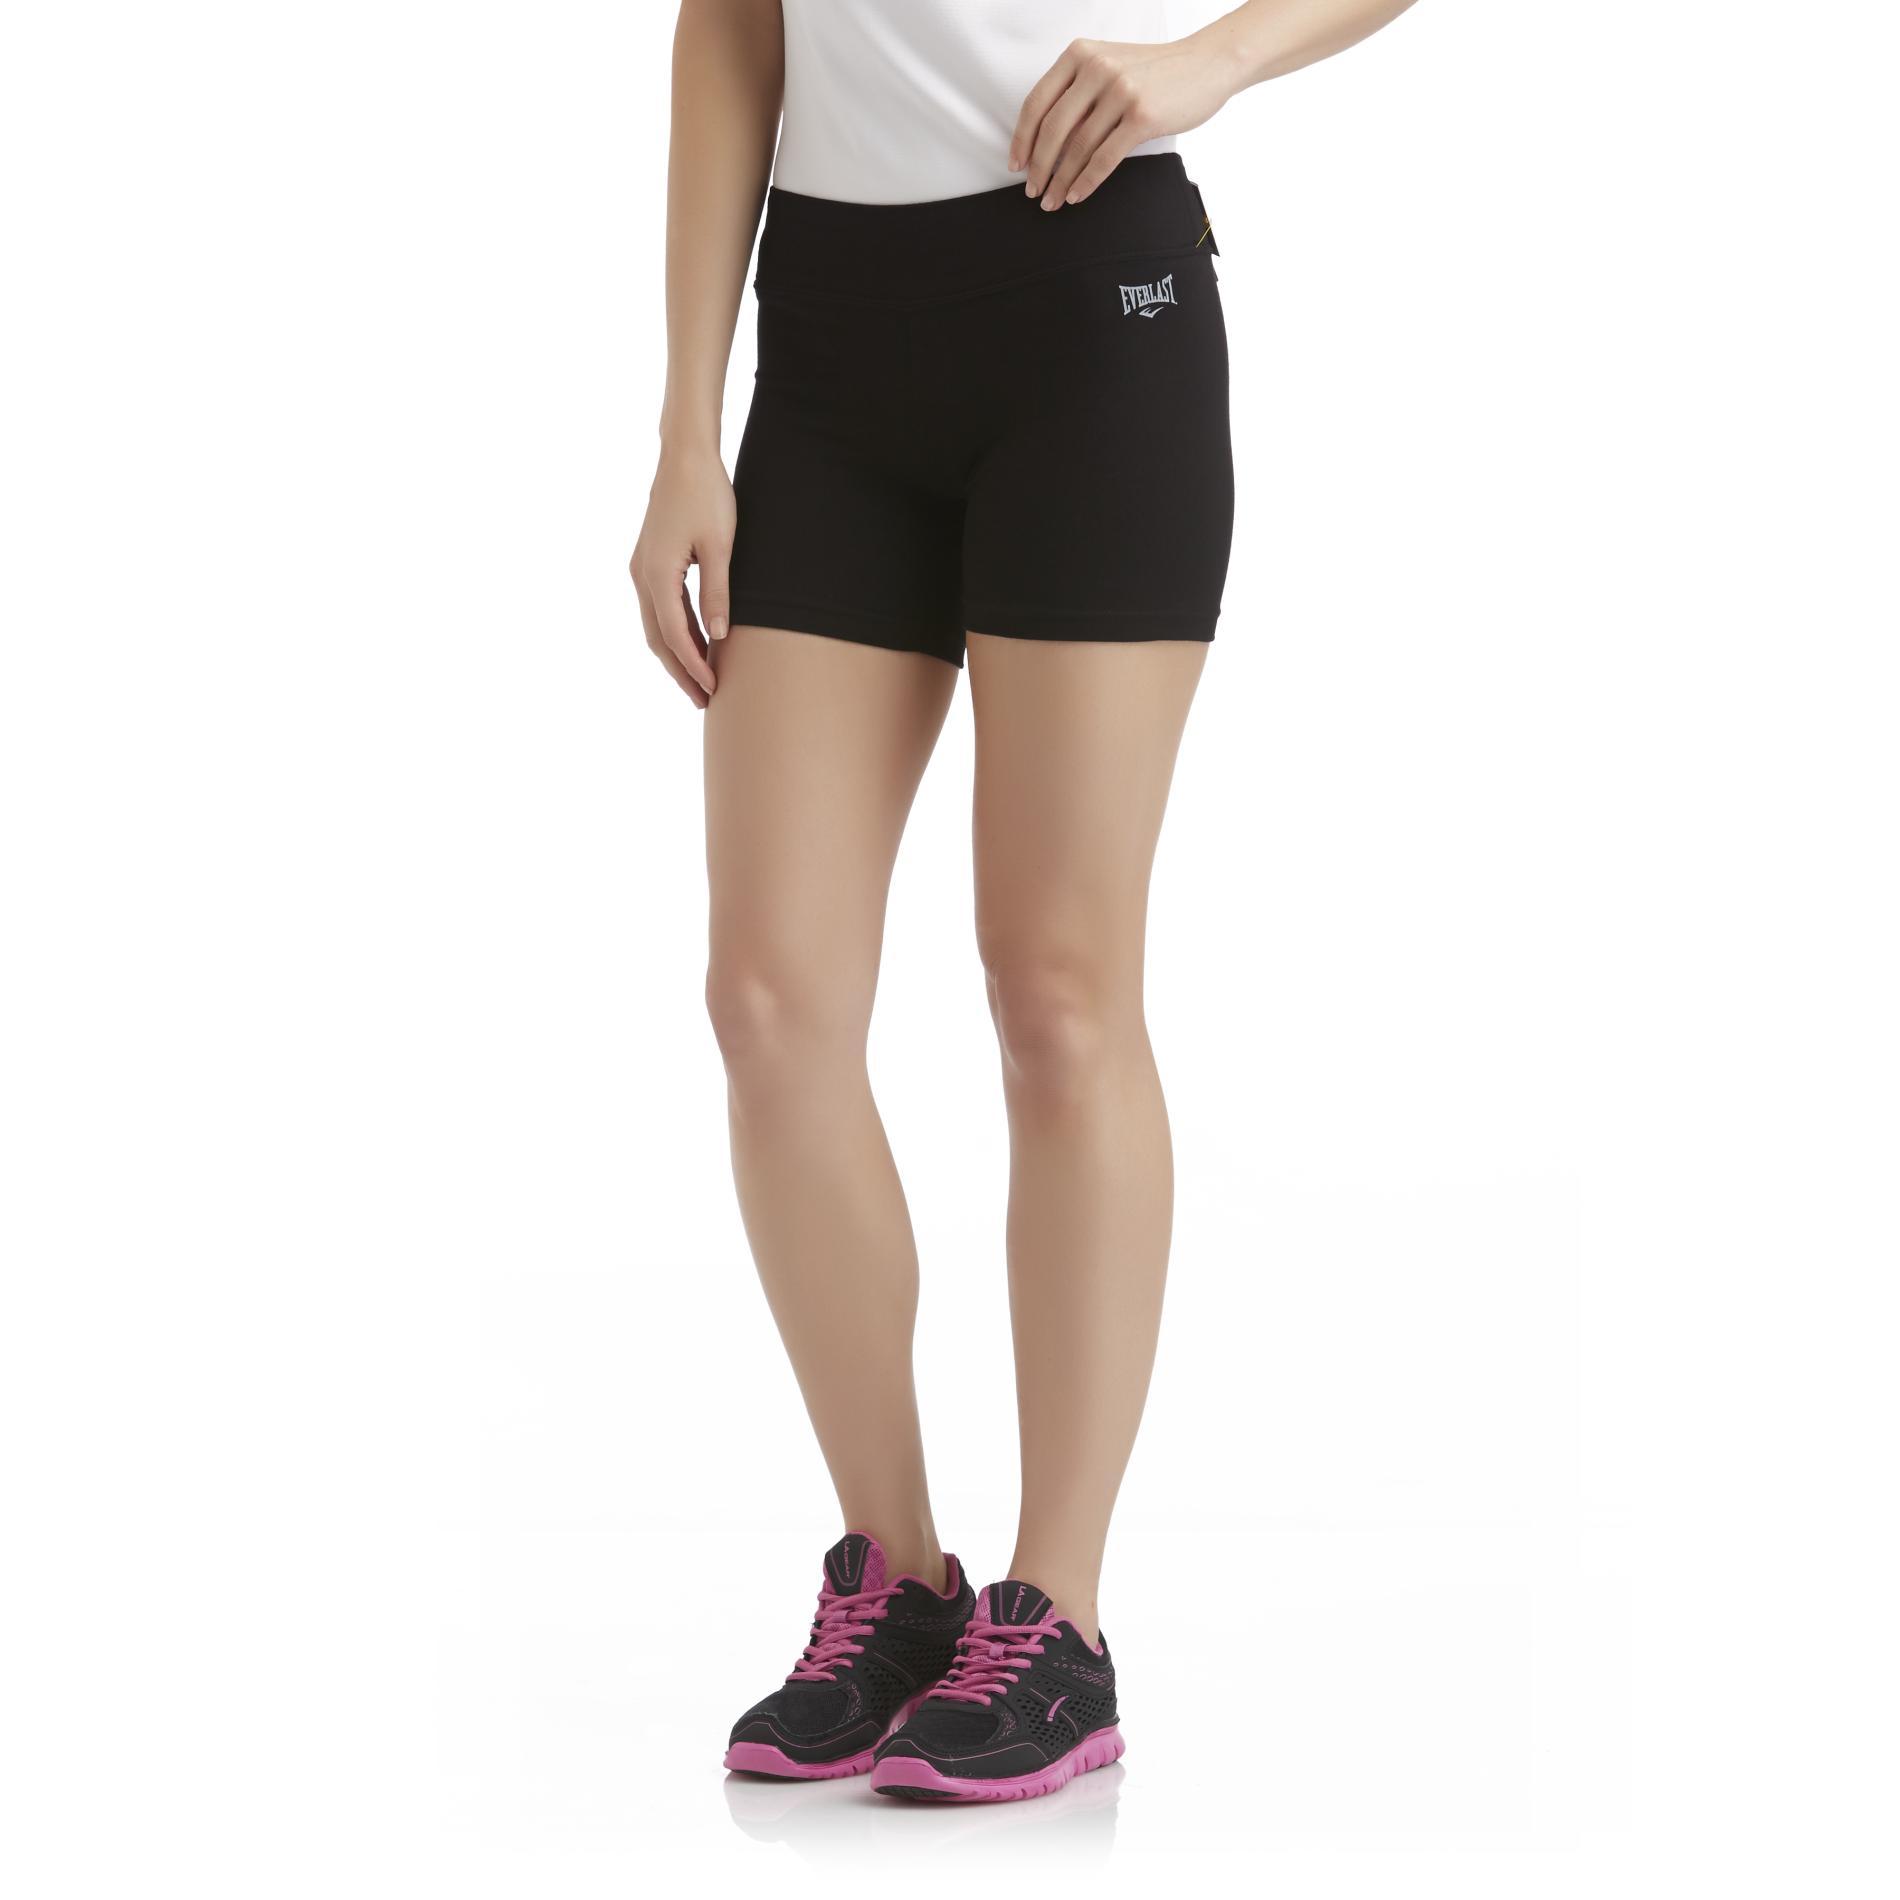 Everlast Women S Bike Shorts